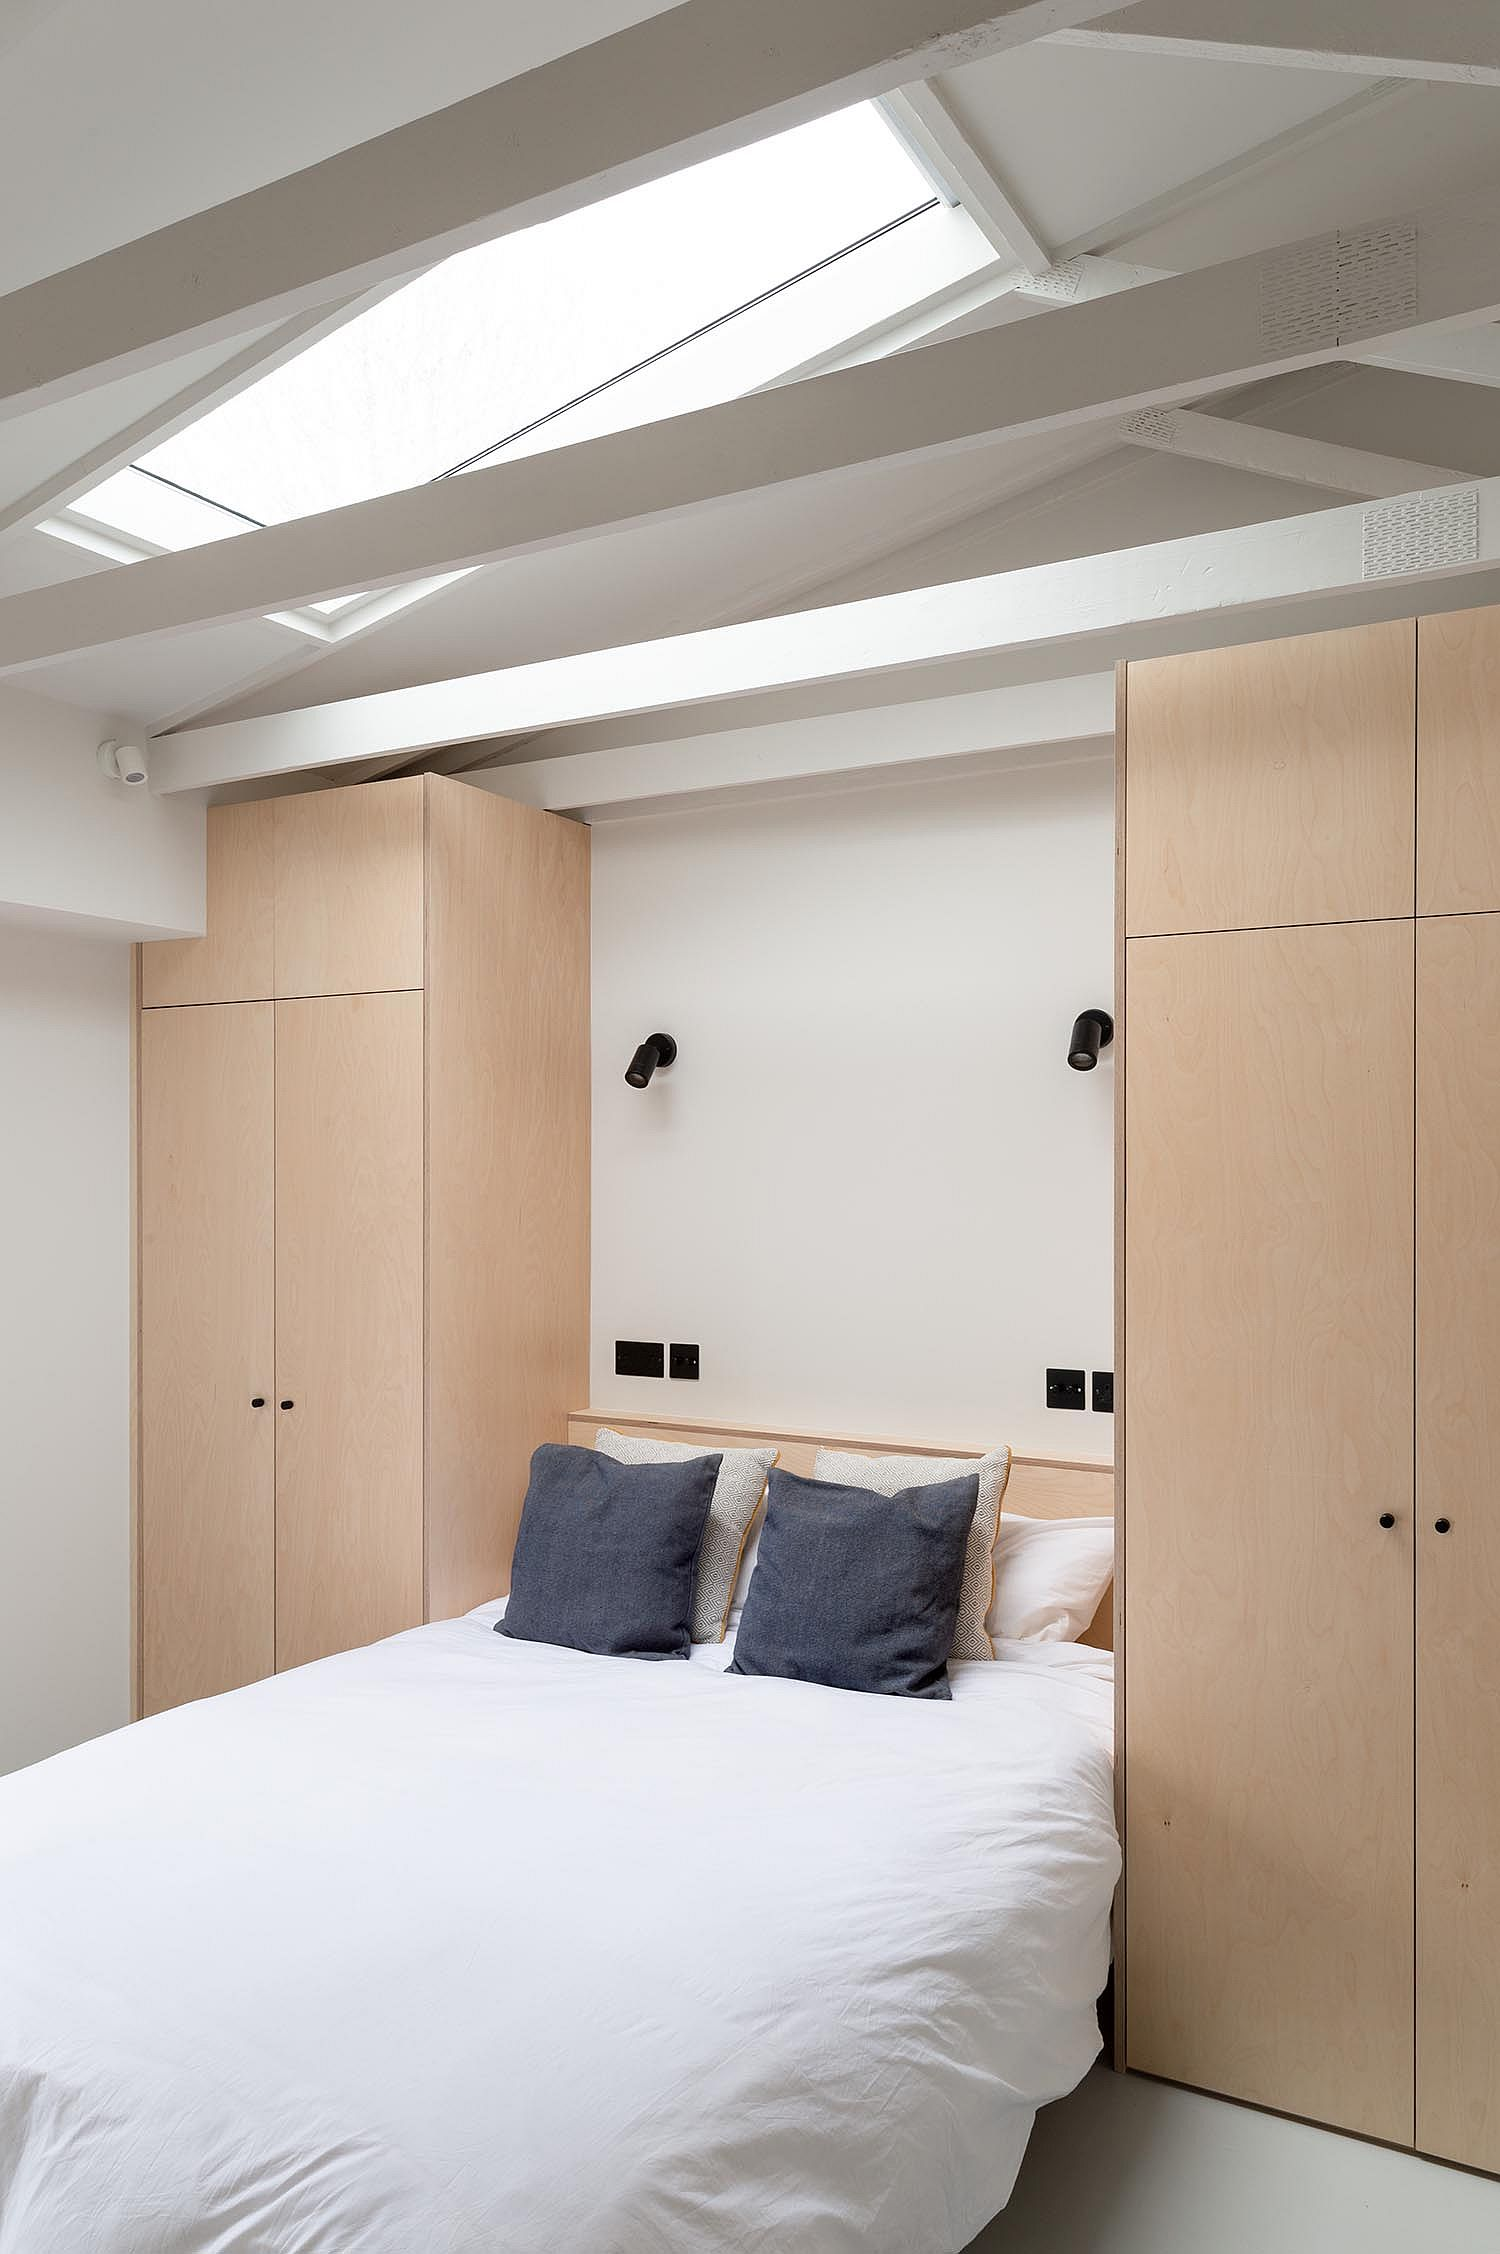 Skylight ushers ample naural light into the bedroom in white